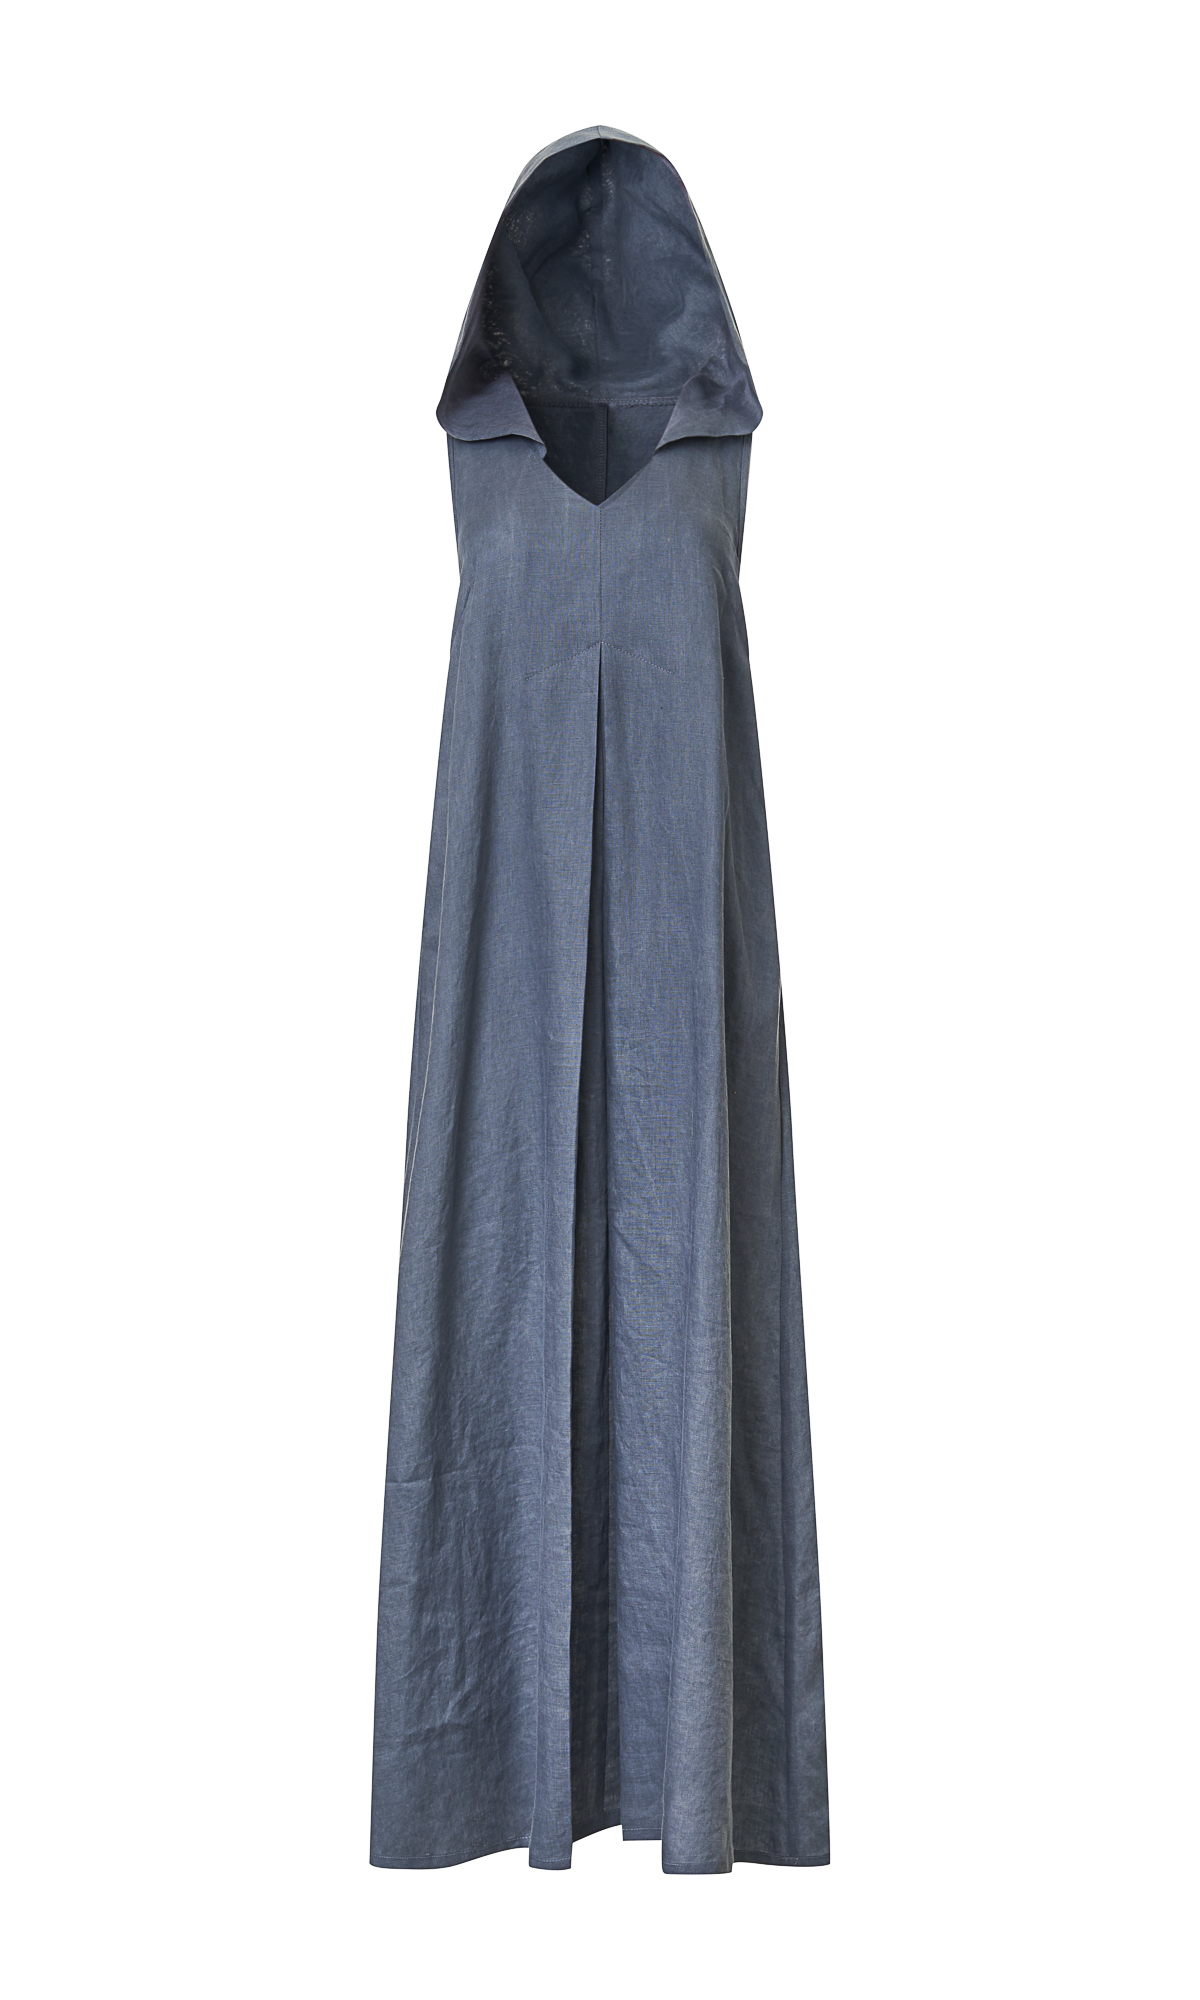 Inverted Pleat Maxi Dress